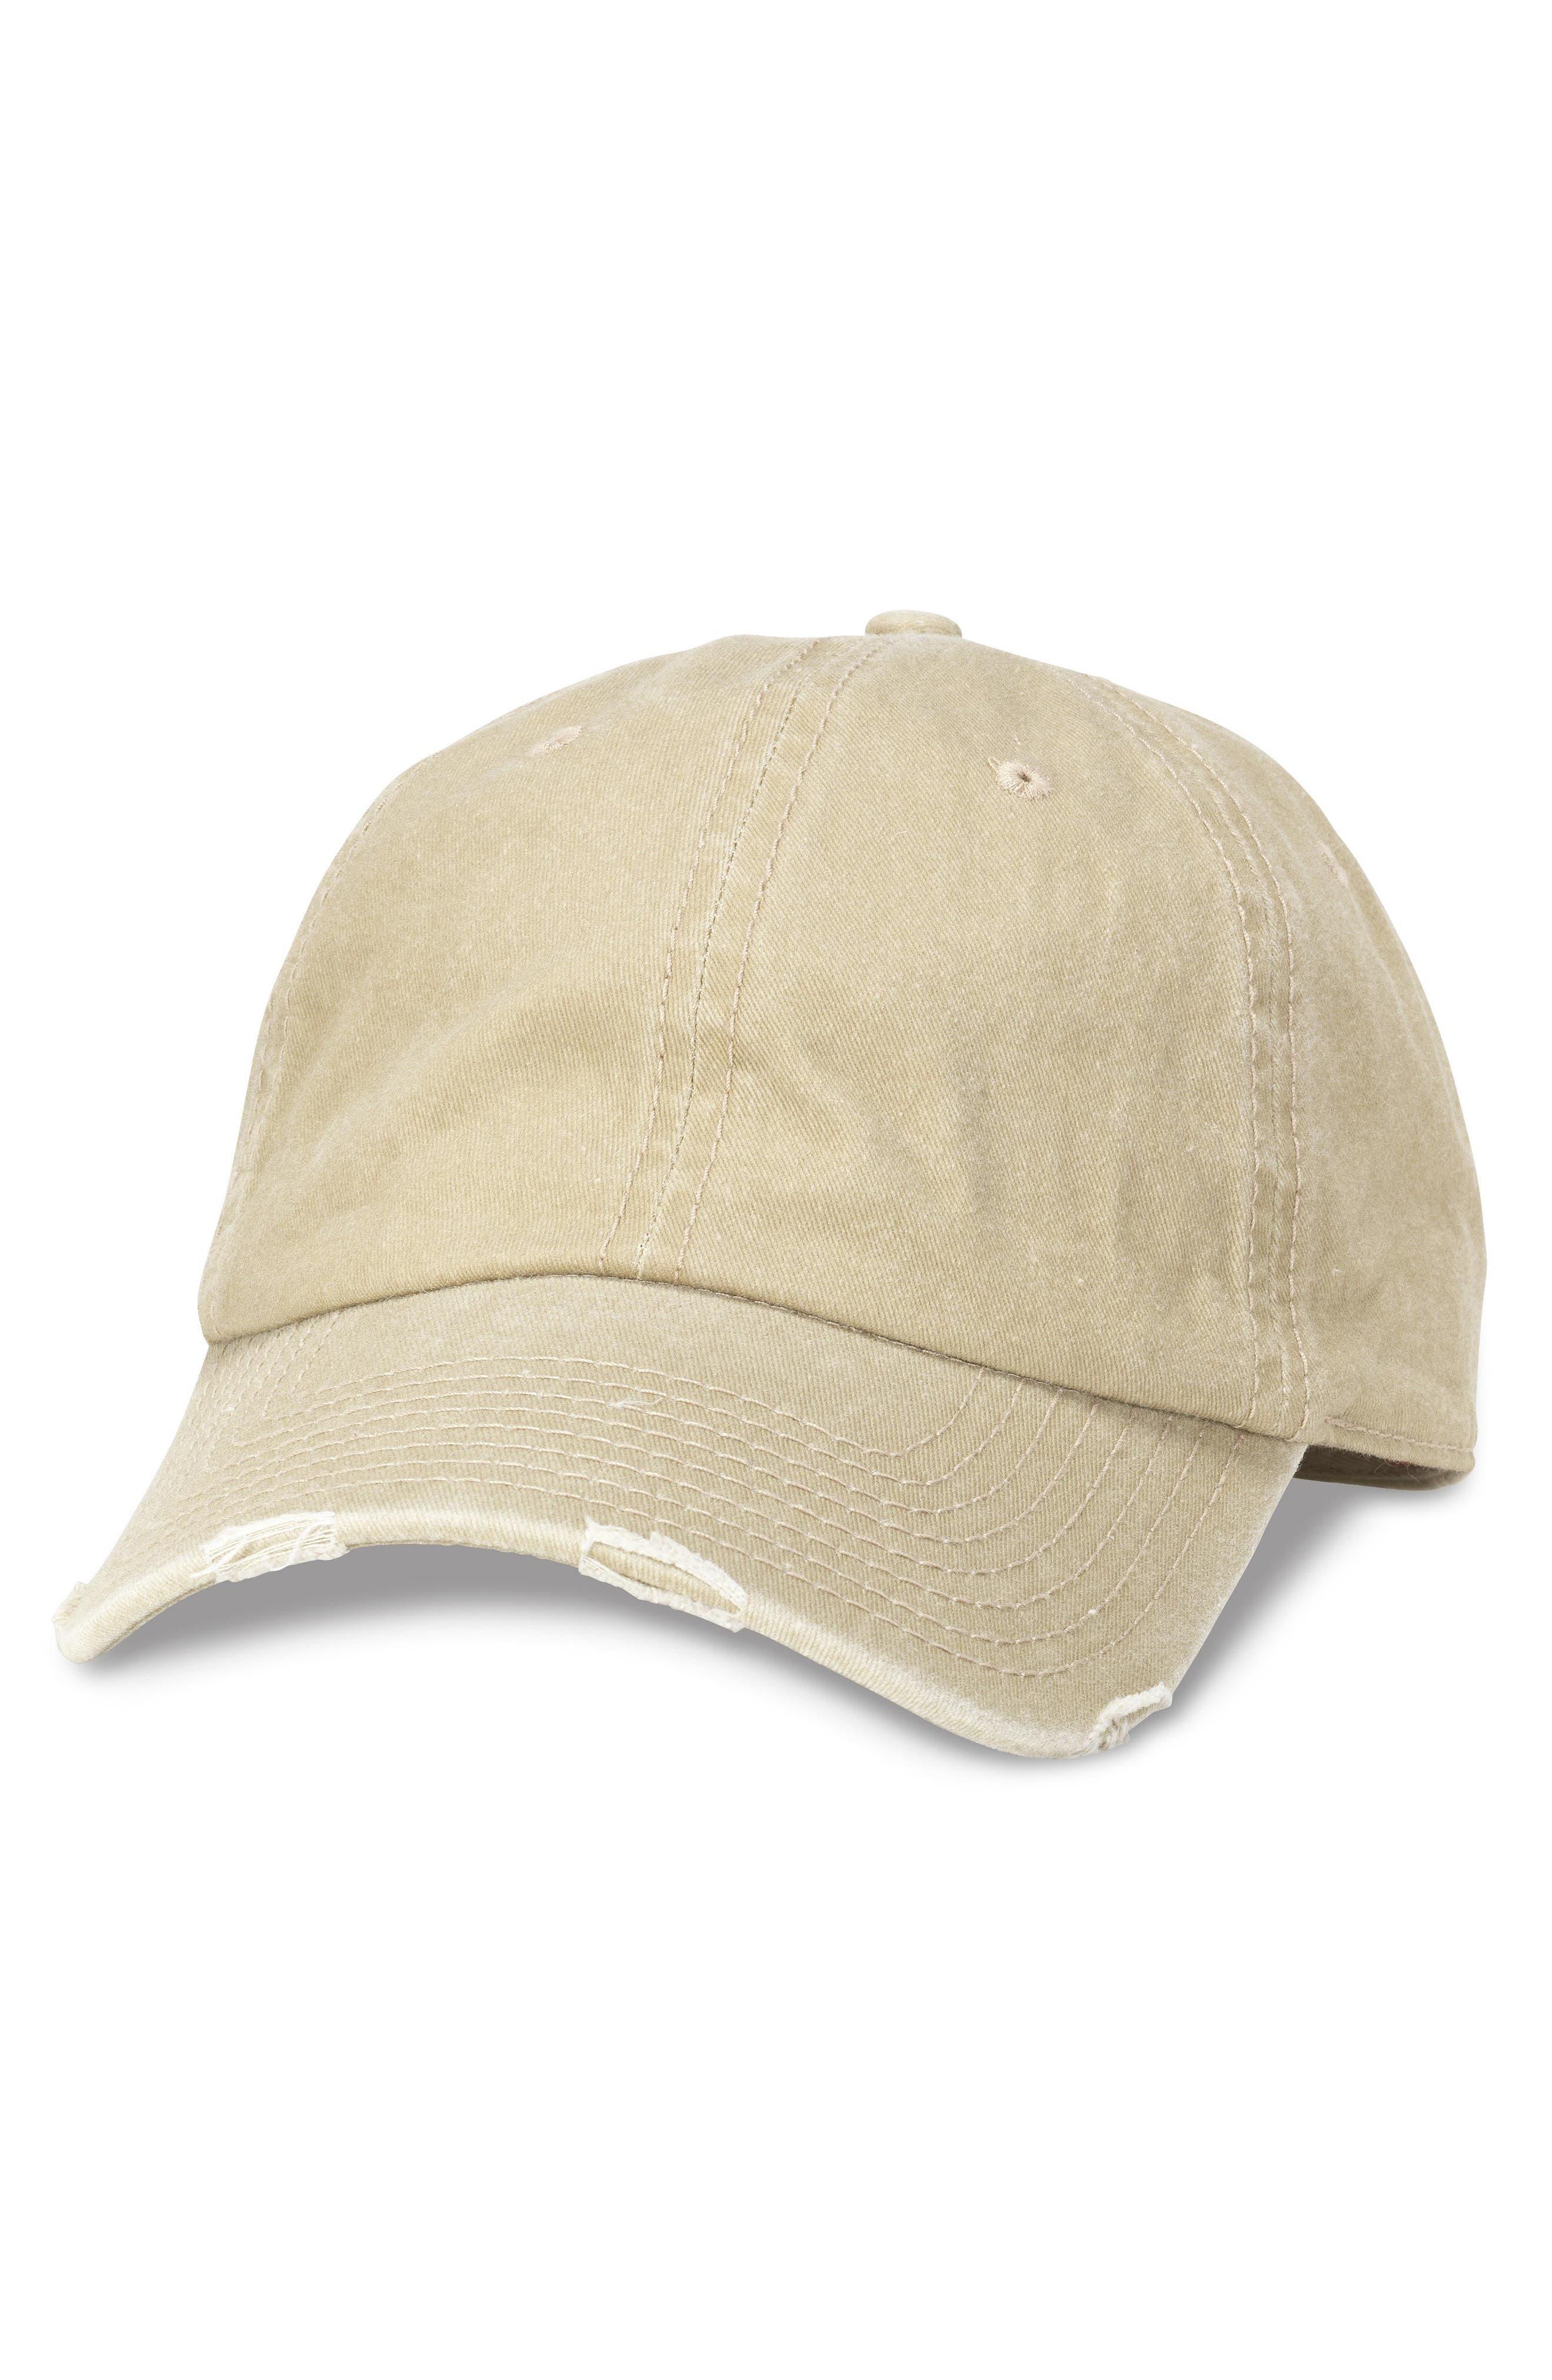 Raglan Legacy Ball Cap,                         Main,                         color, Khaki